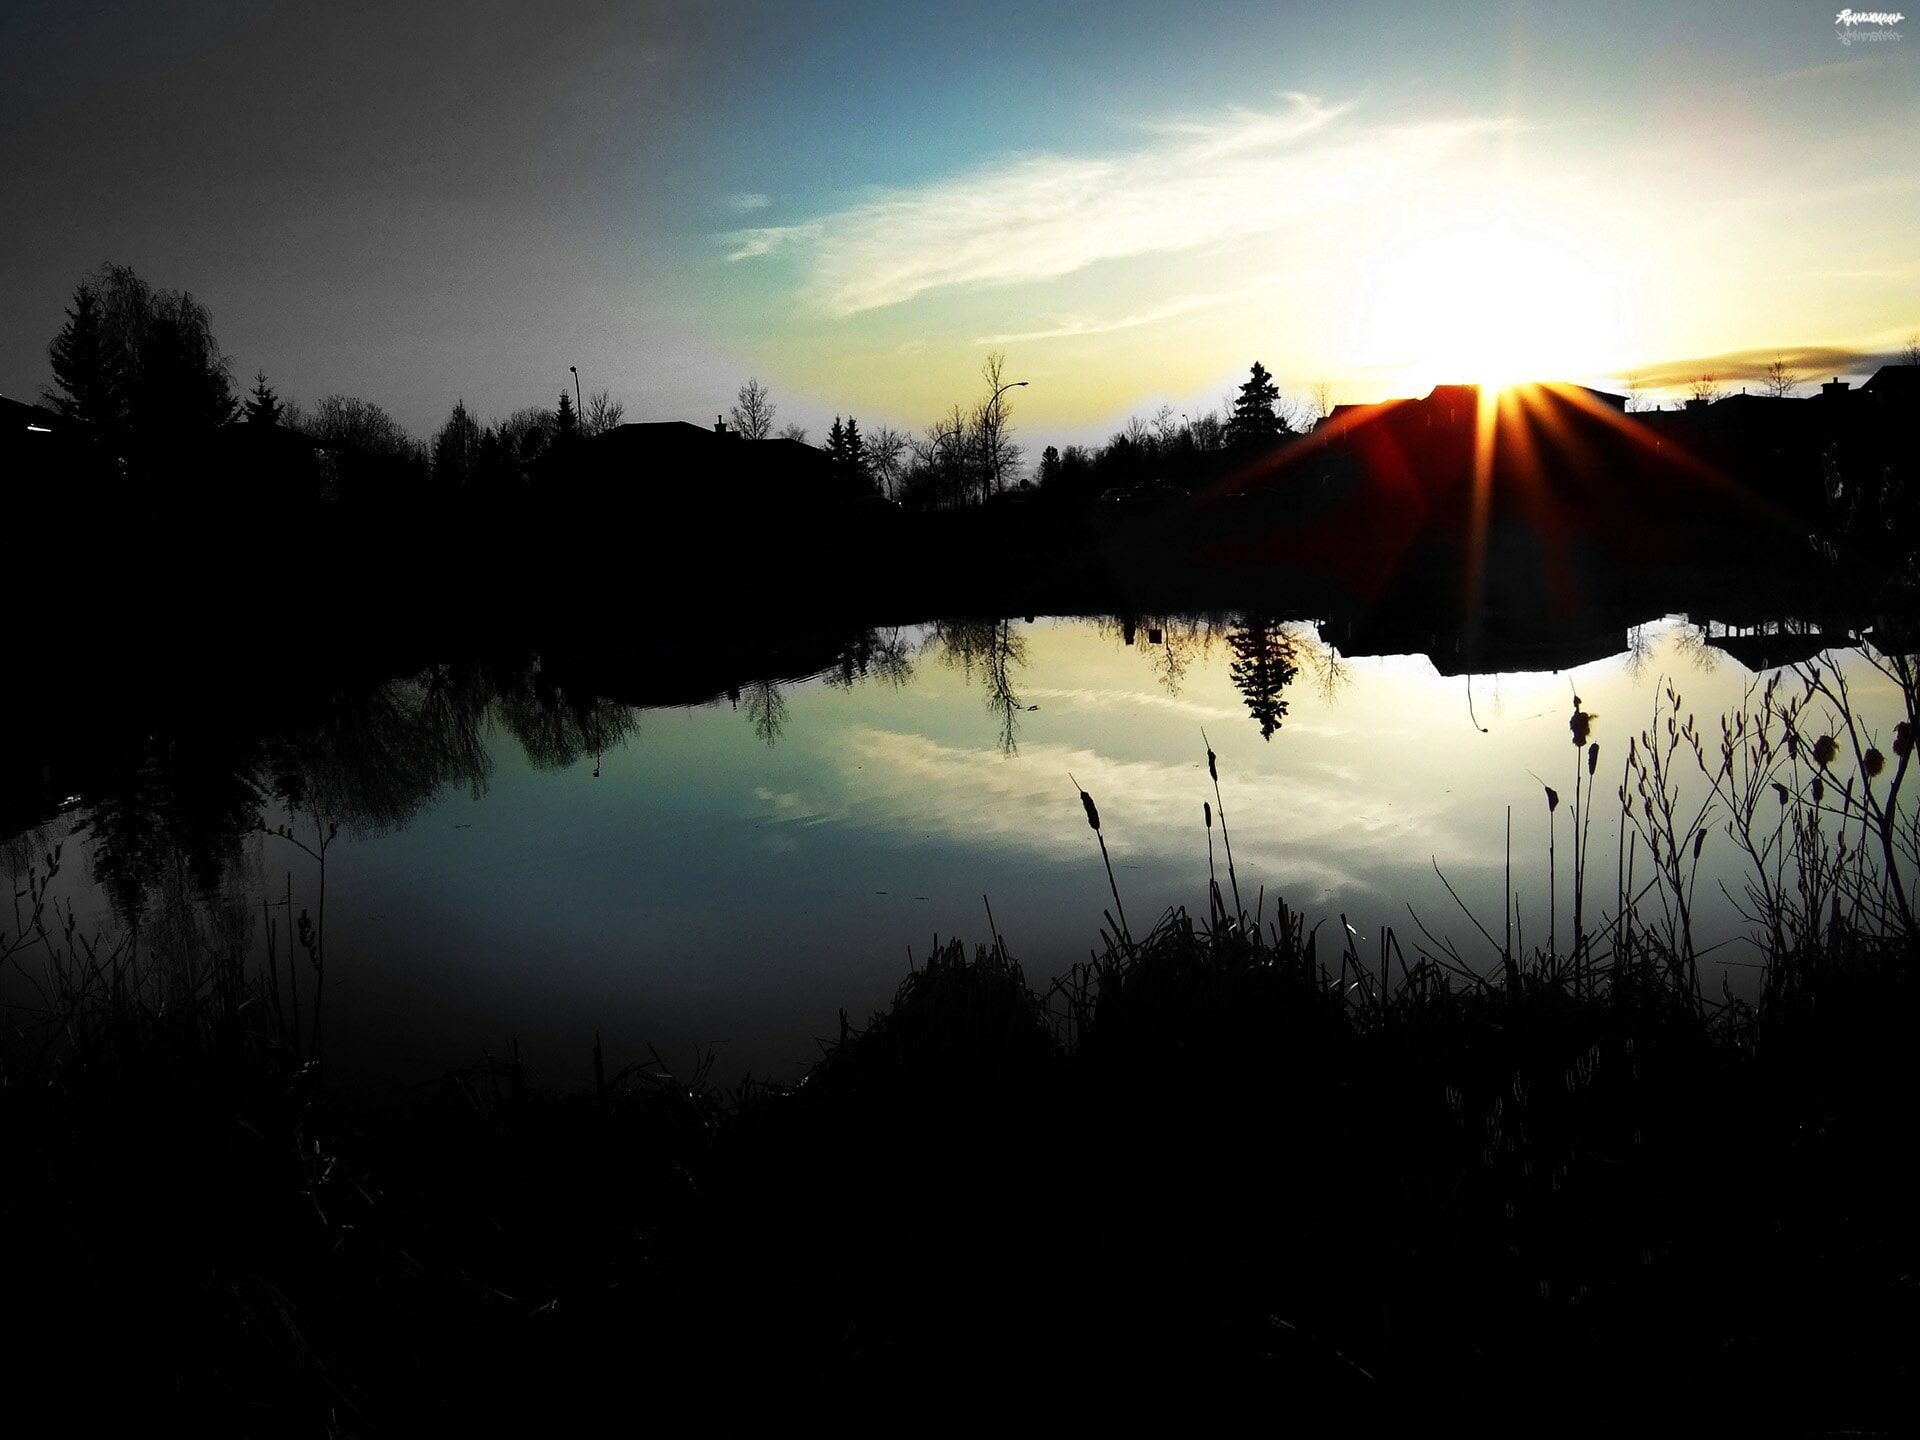 sta-pond-1-amourbliss